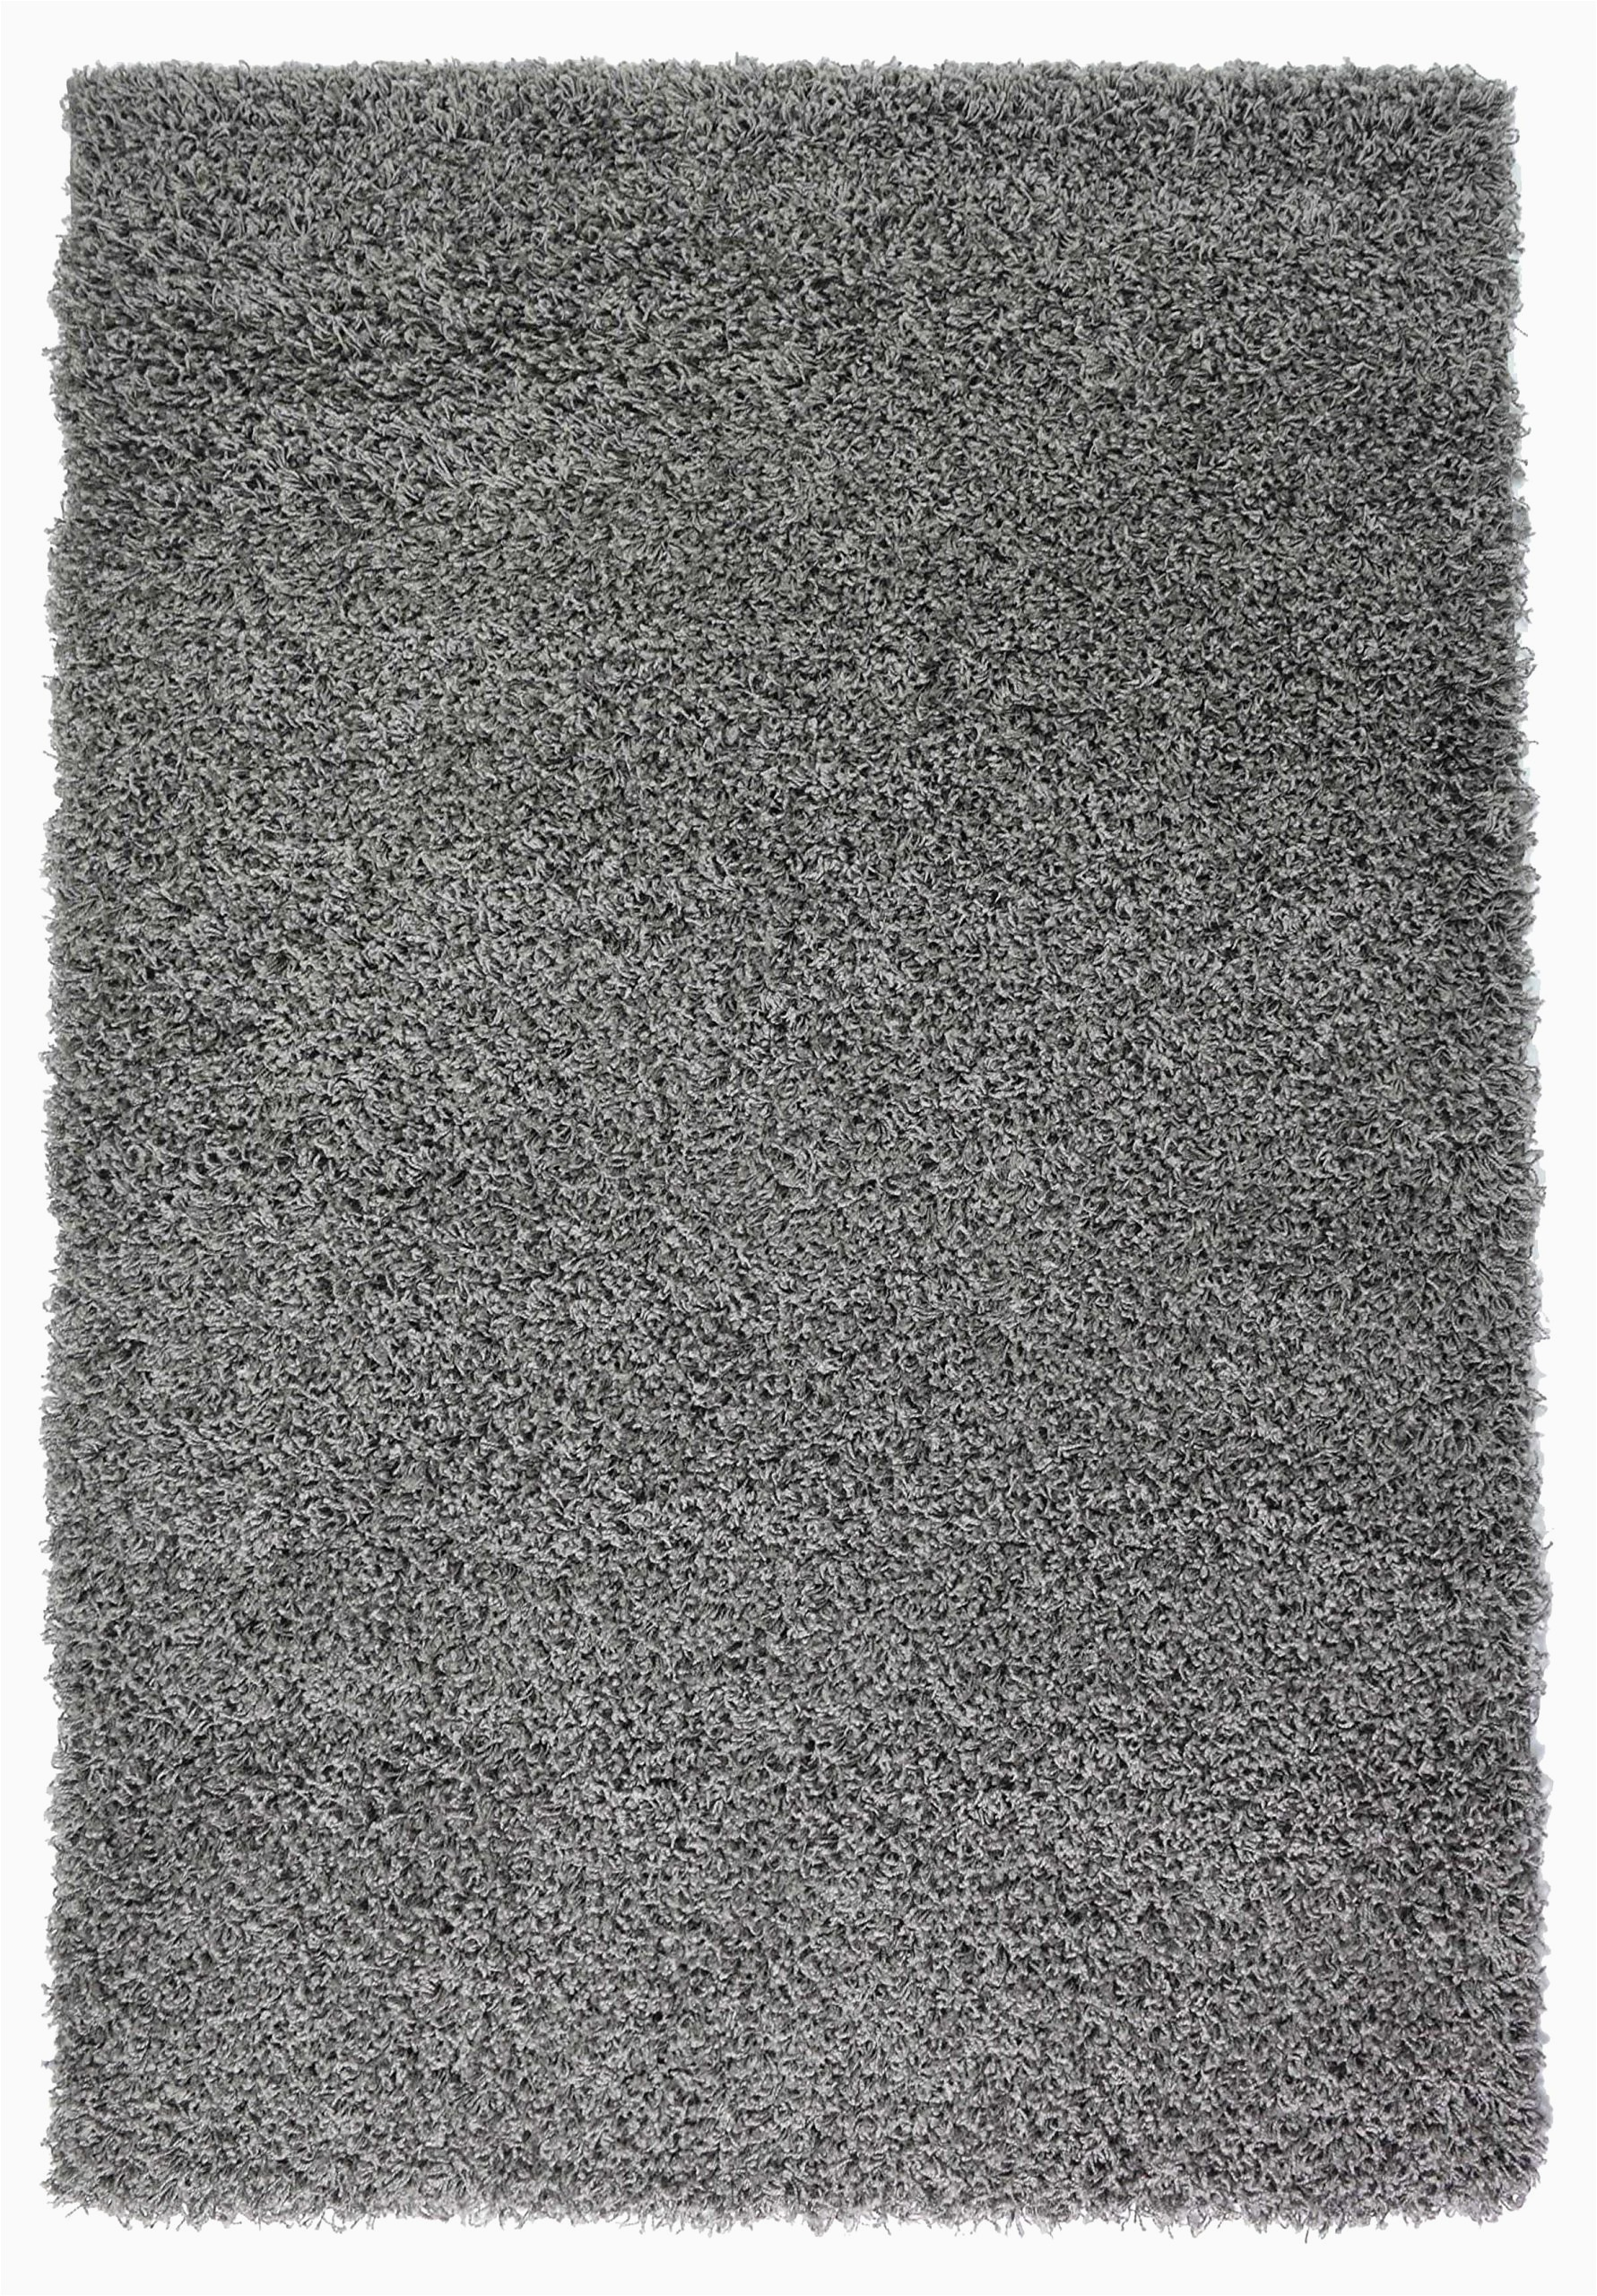 extra large rug 5cm thick shag pile soft shaggy area rugs modern carpet living room bedroom mats 160x230cm 5 3 x7 7 dark grey